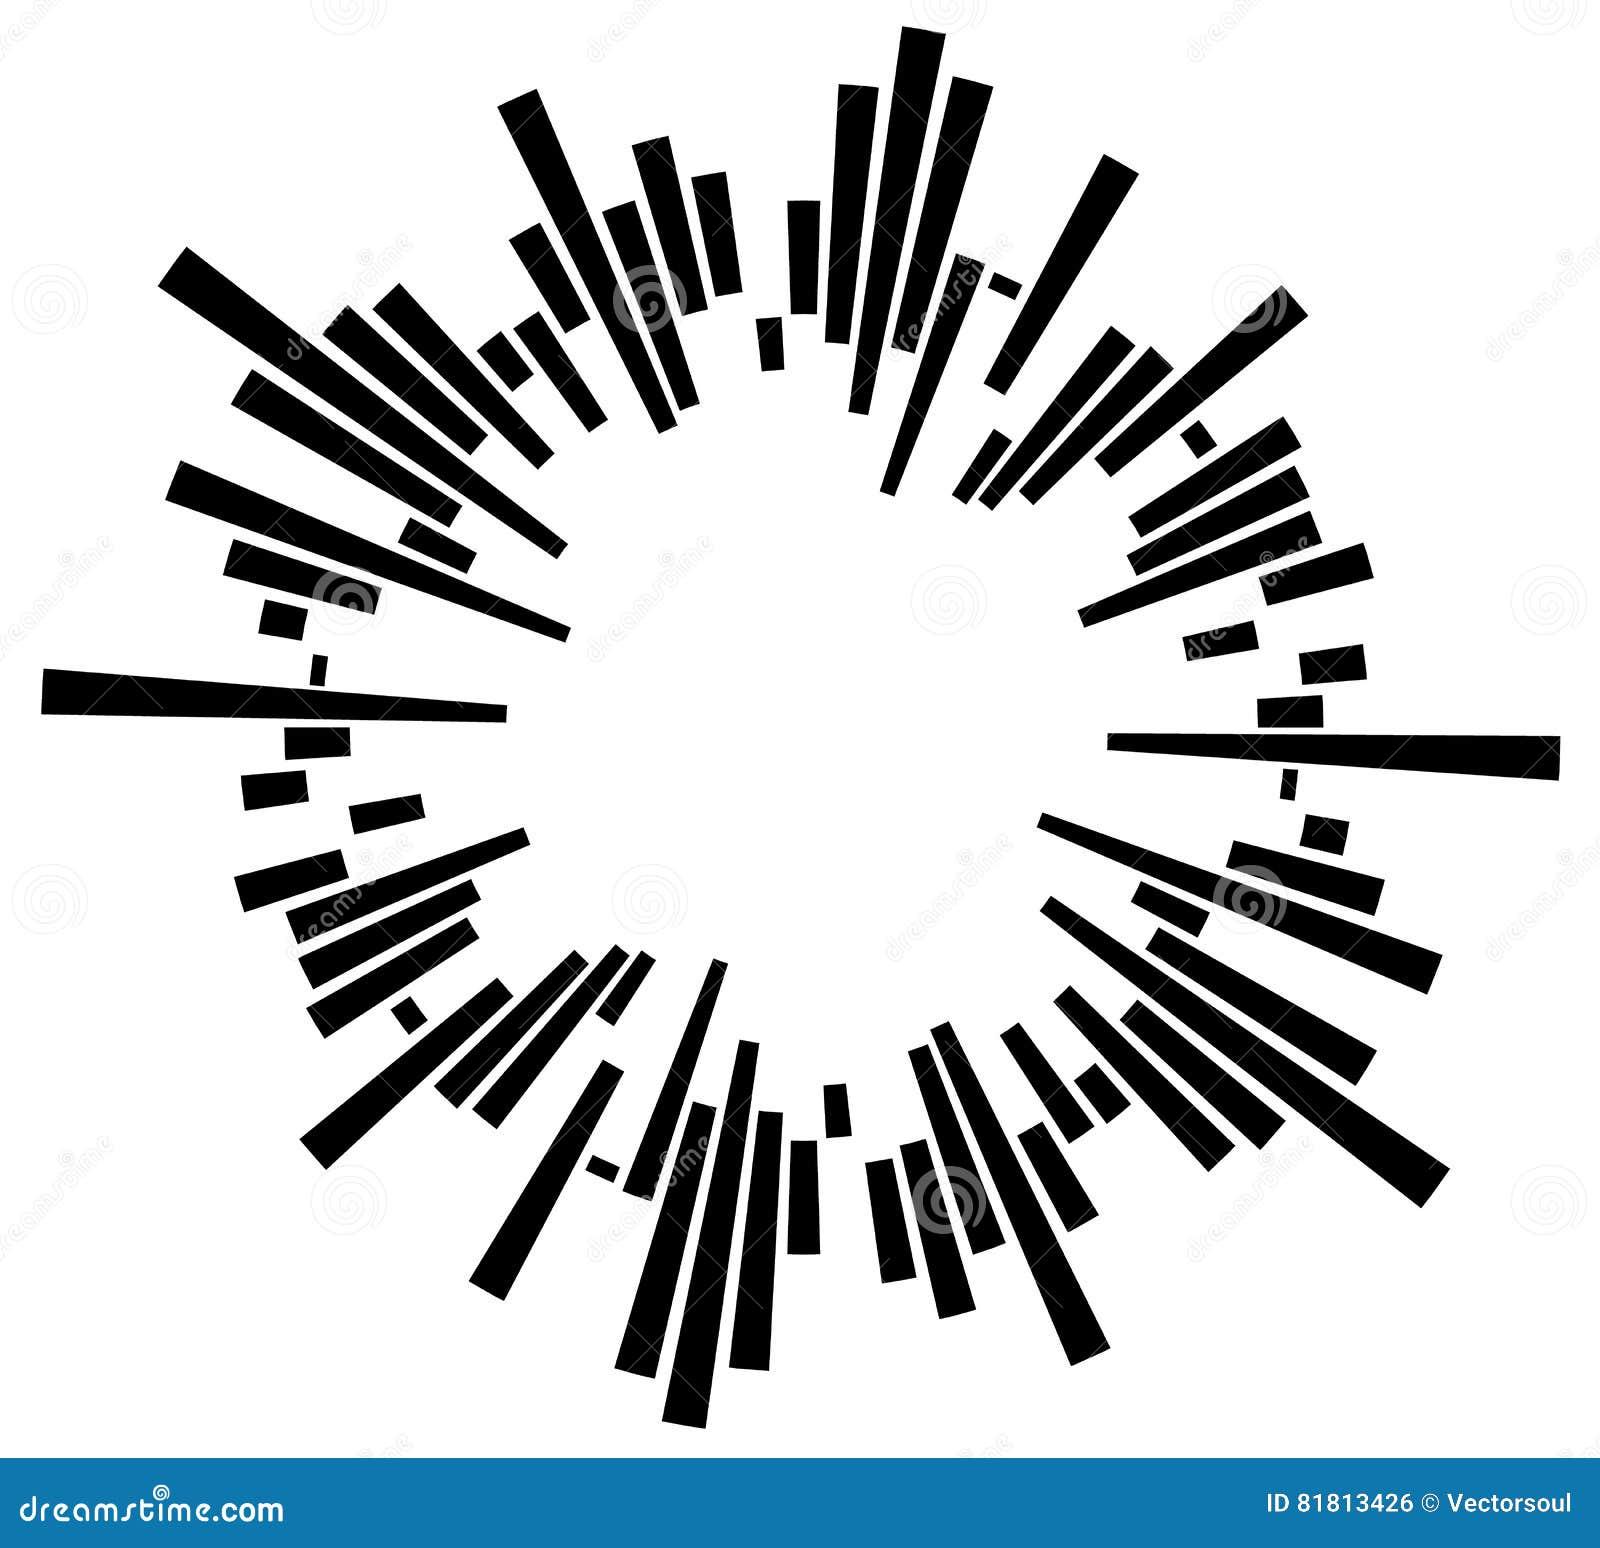 Geometric circular element with irregular radial lines, bars. Re